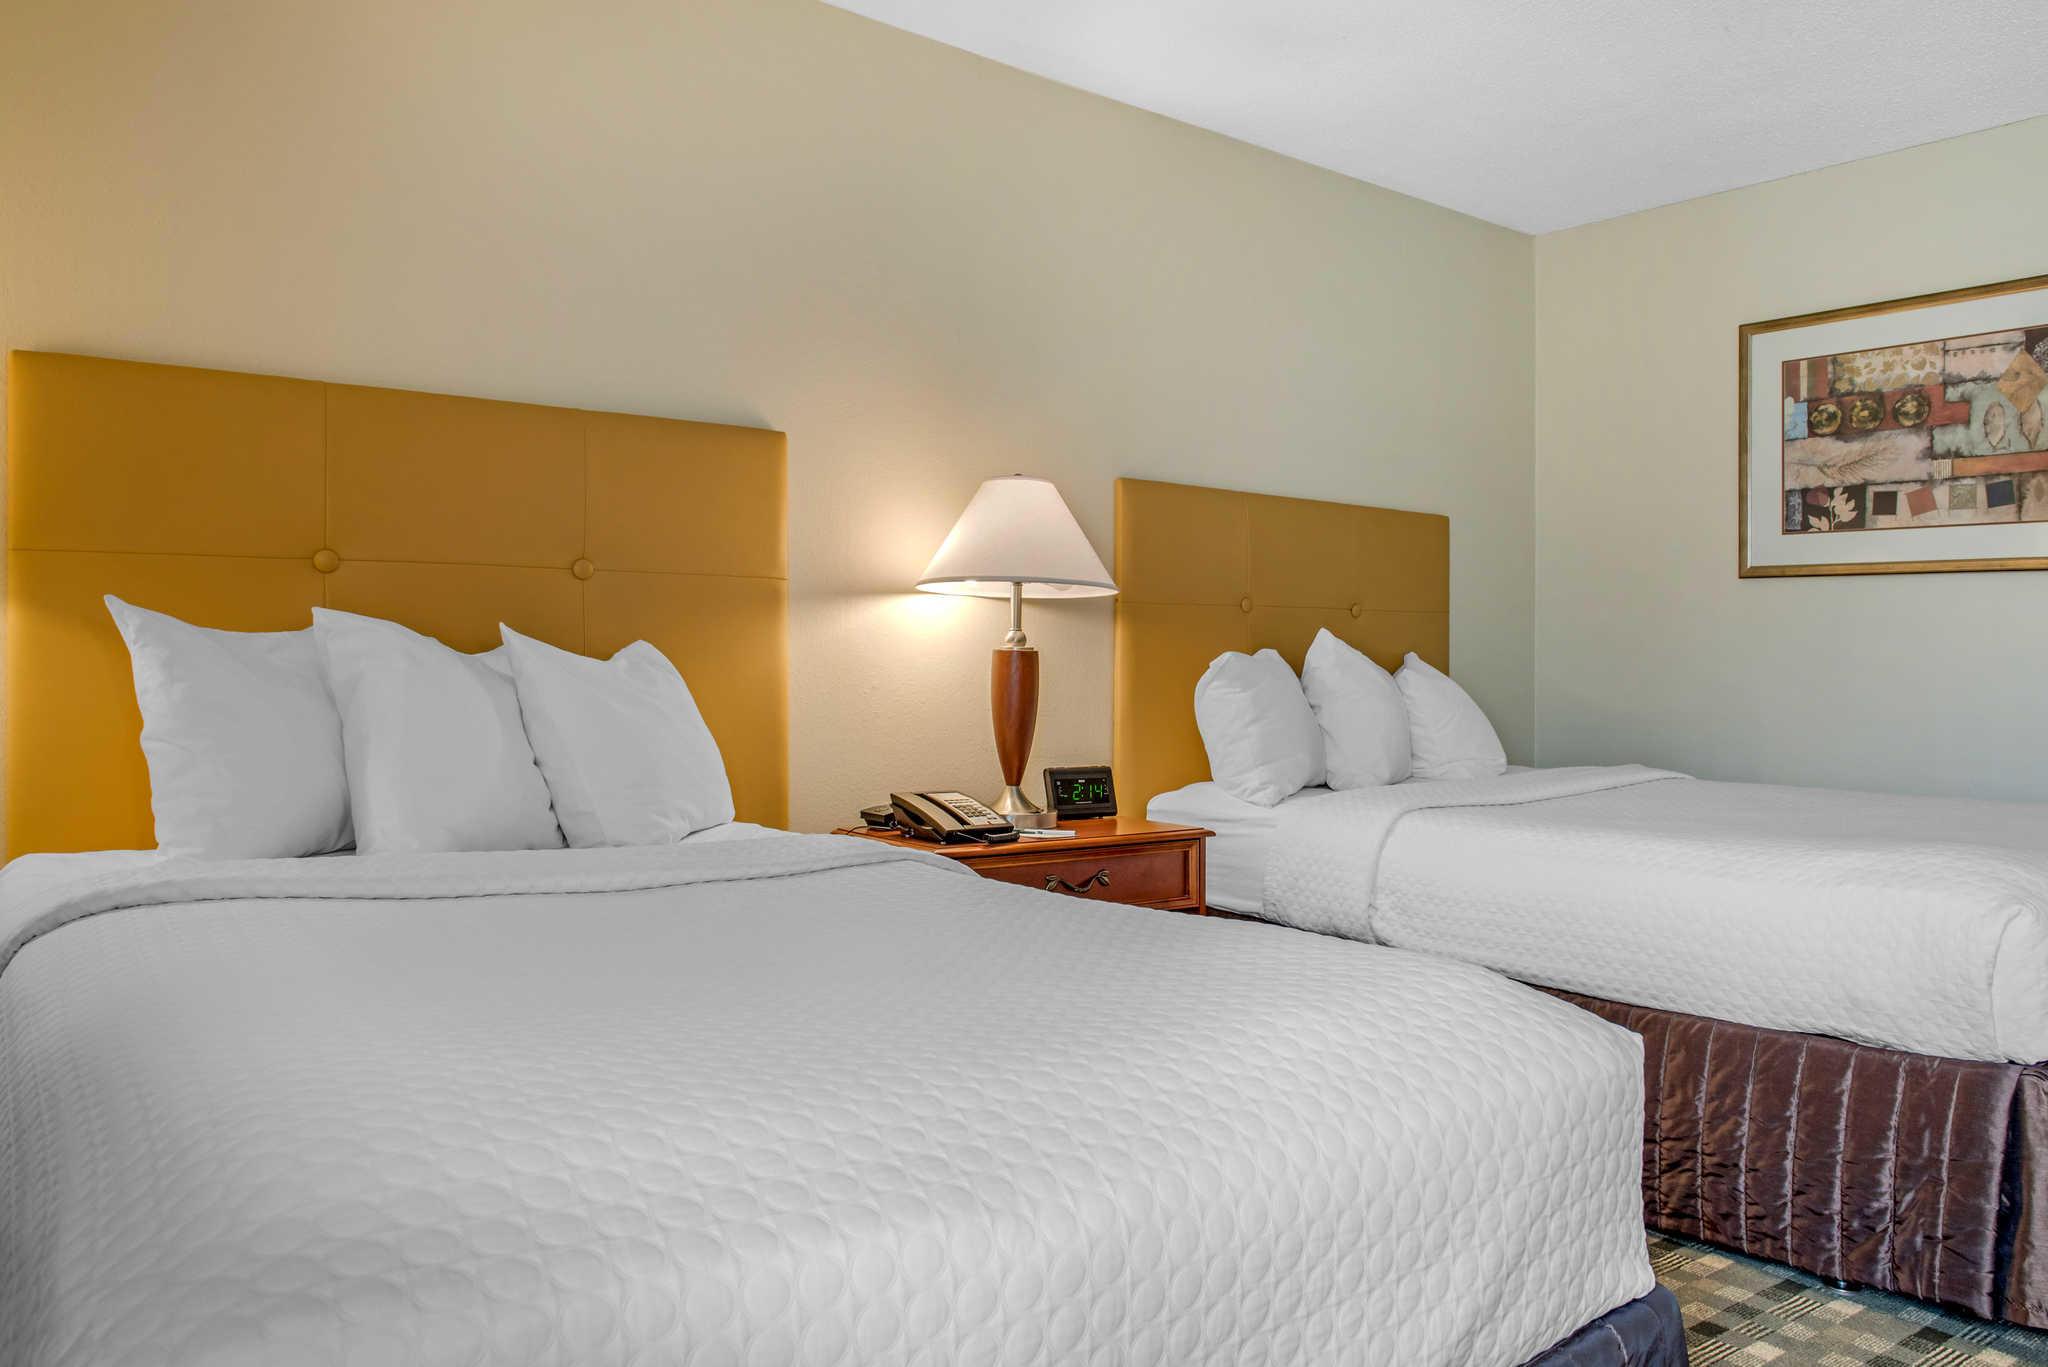 Quality Hotel - Cincinnati Blue Ash image 8